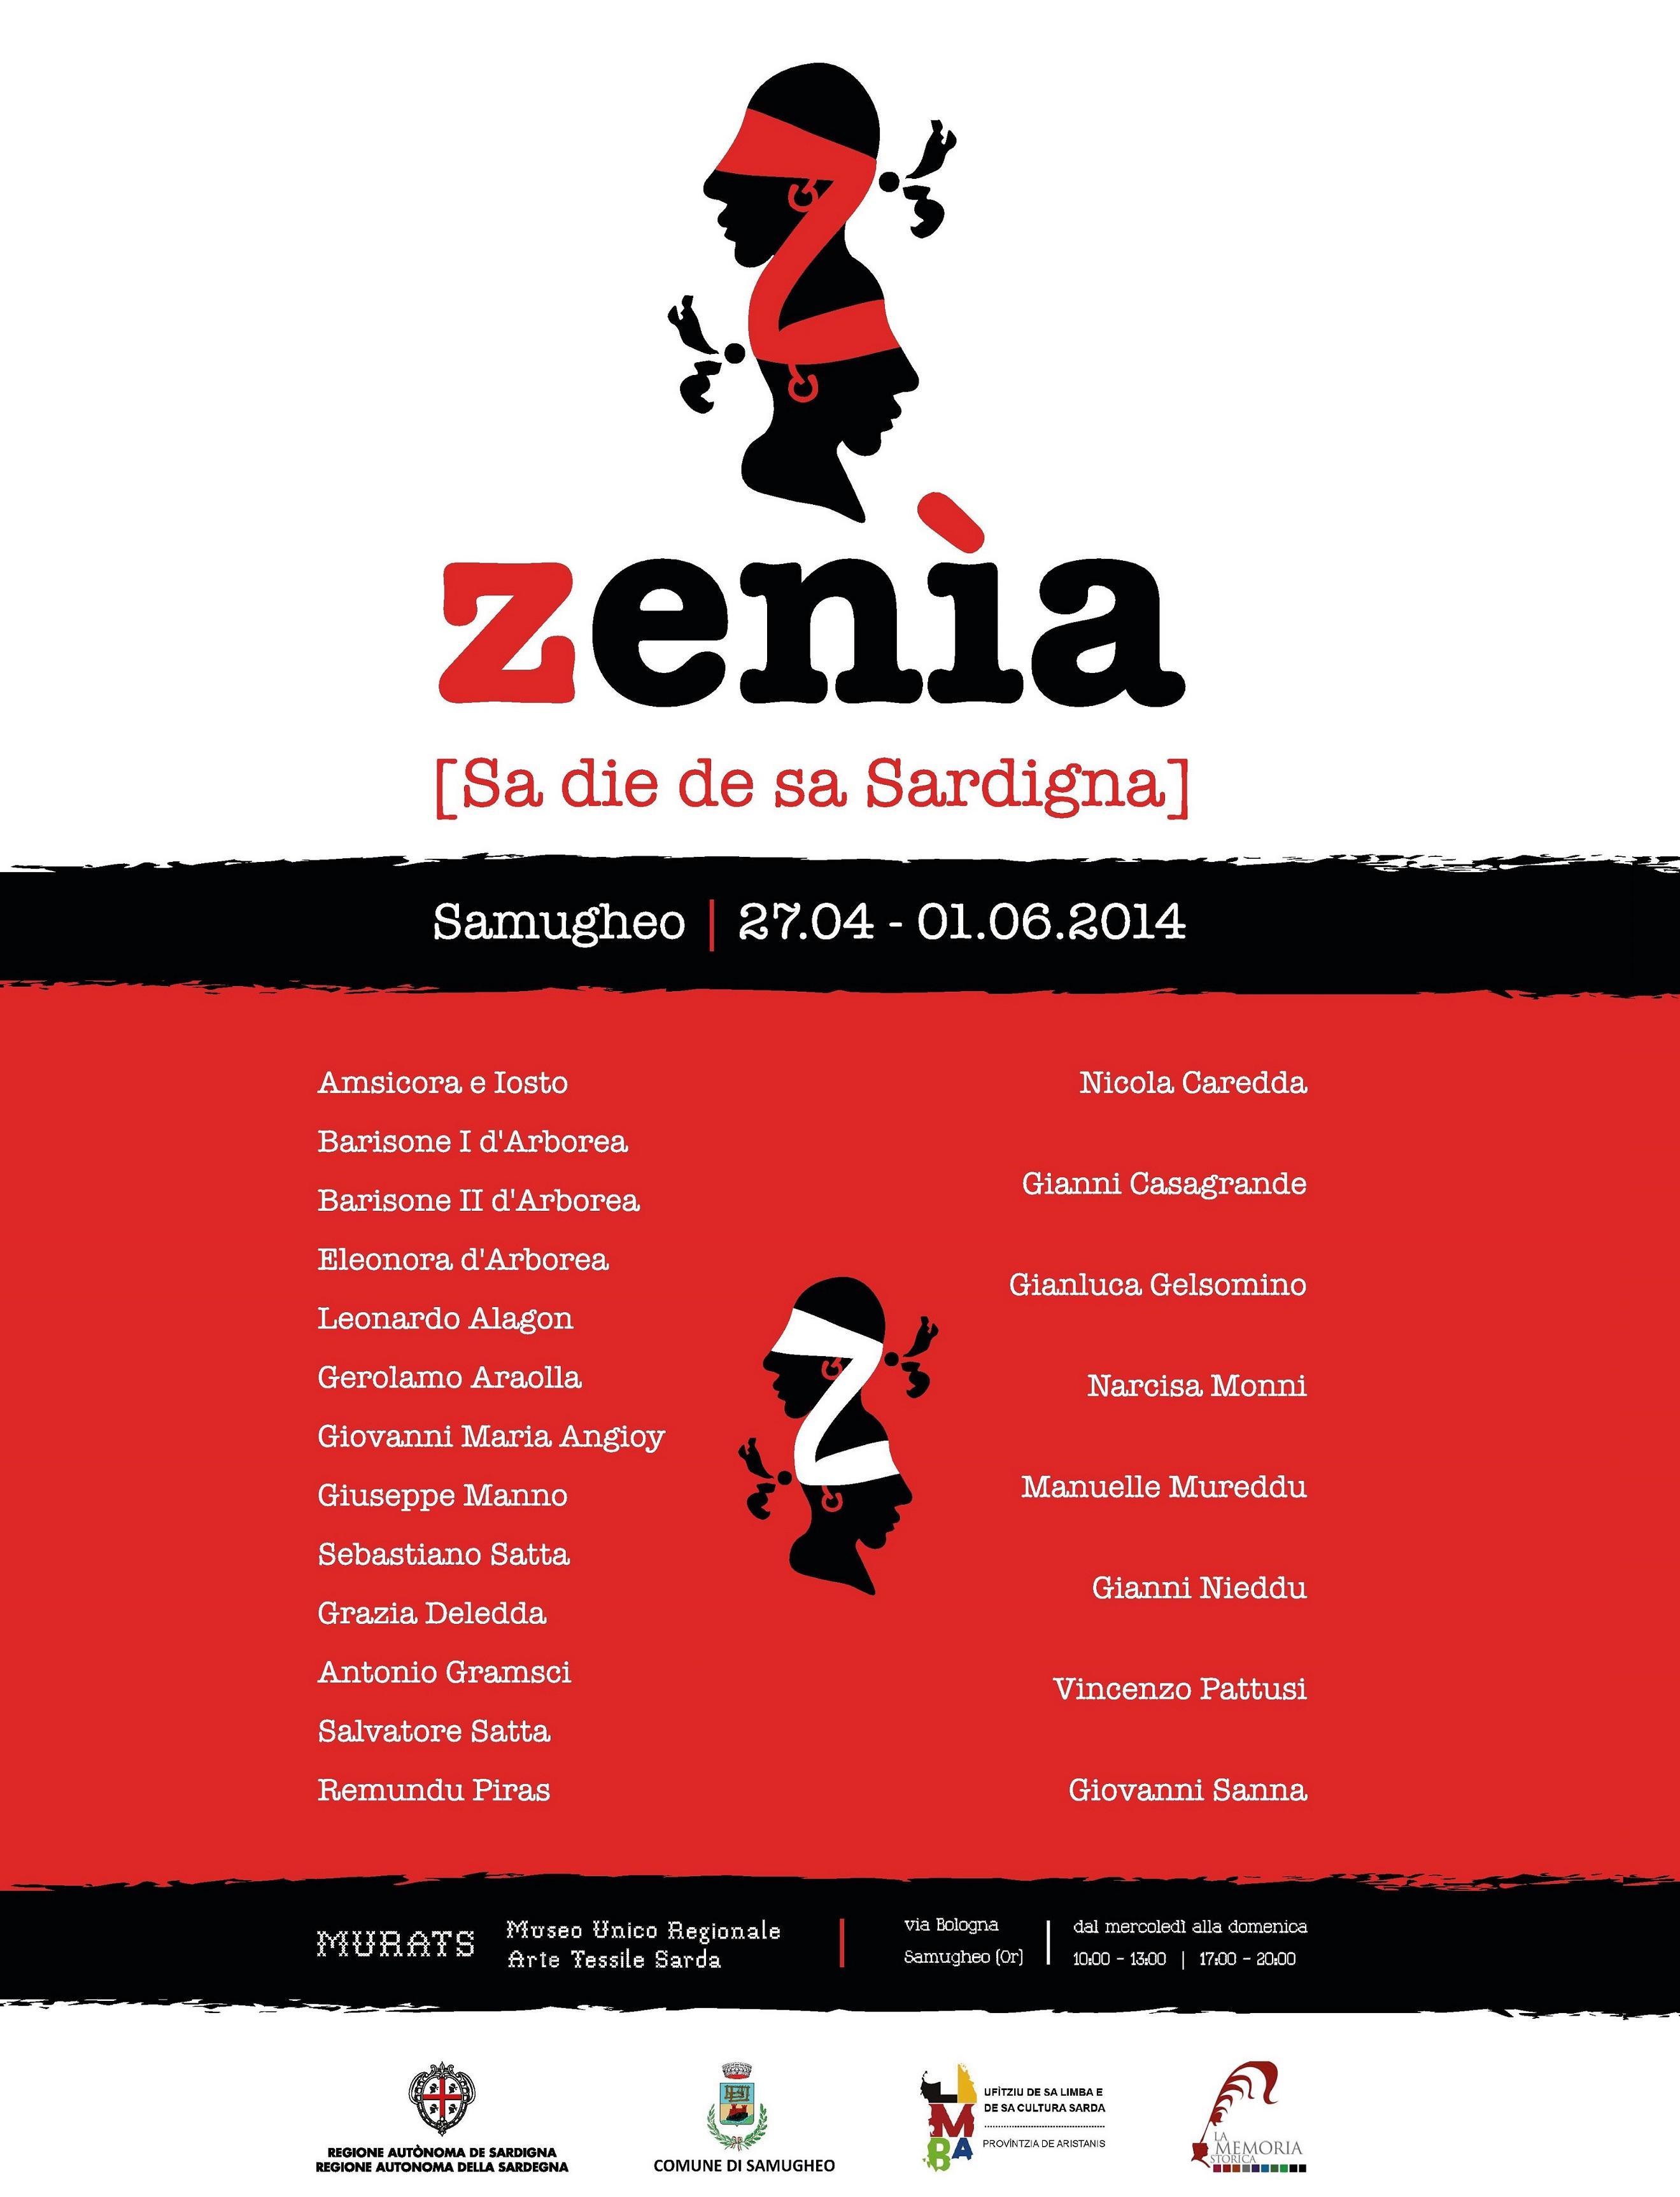 LOCANDINA MUSEO MURATS APRILE 2014 MOSTRA ZENIA